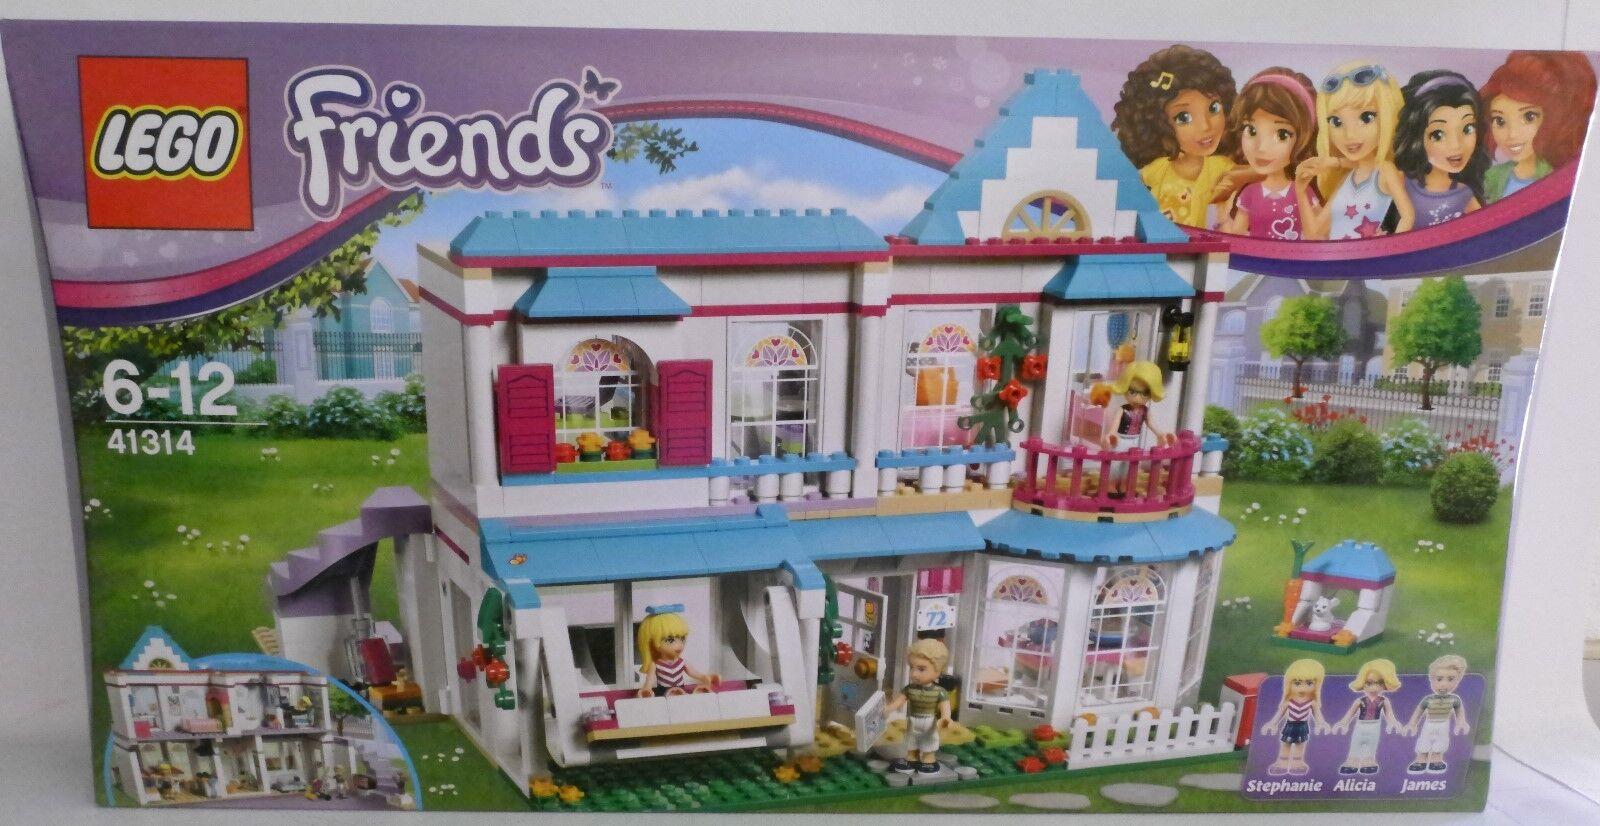 NEU LEGO® Friends 41314 Stephanies Haus OVP